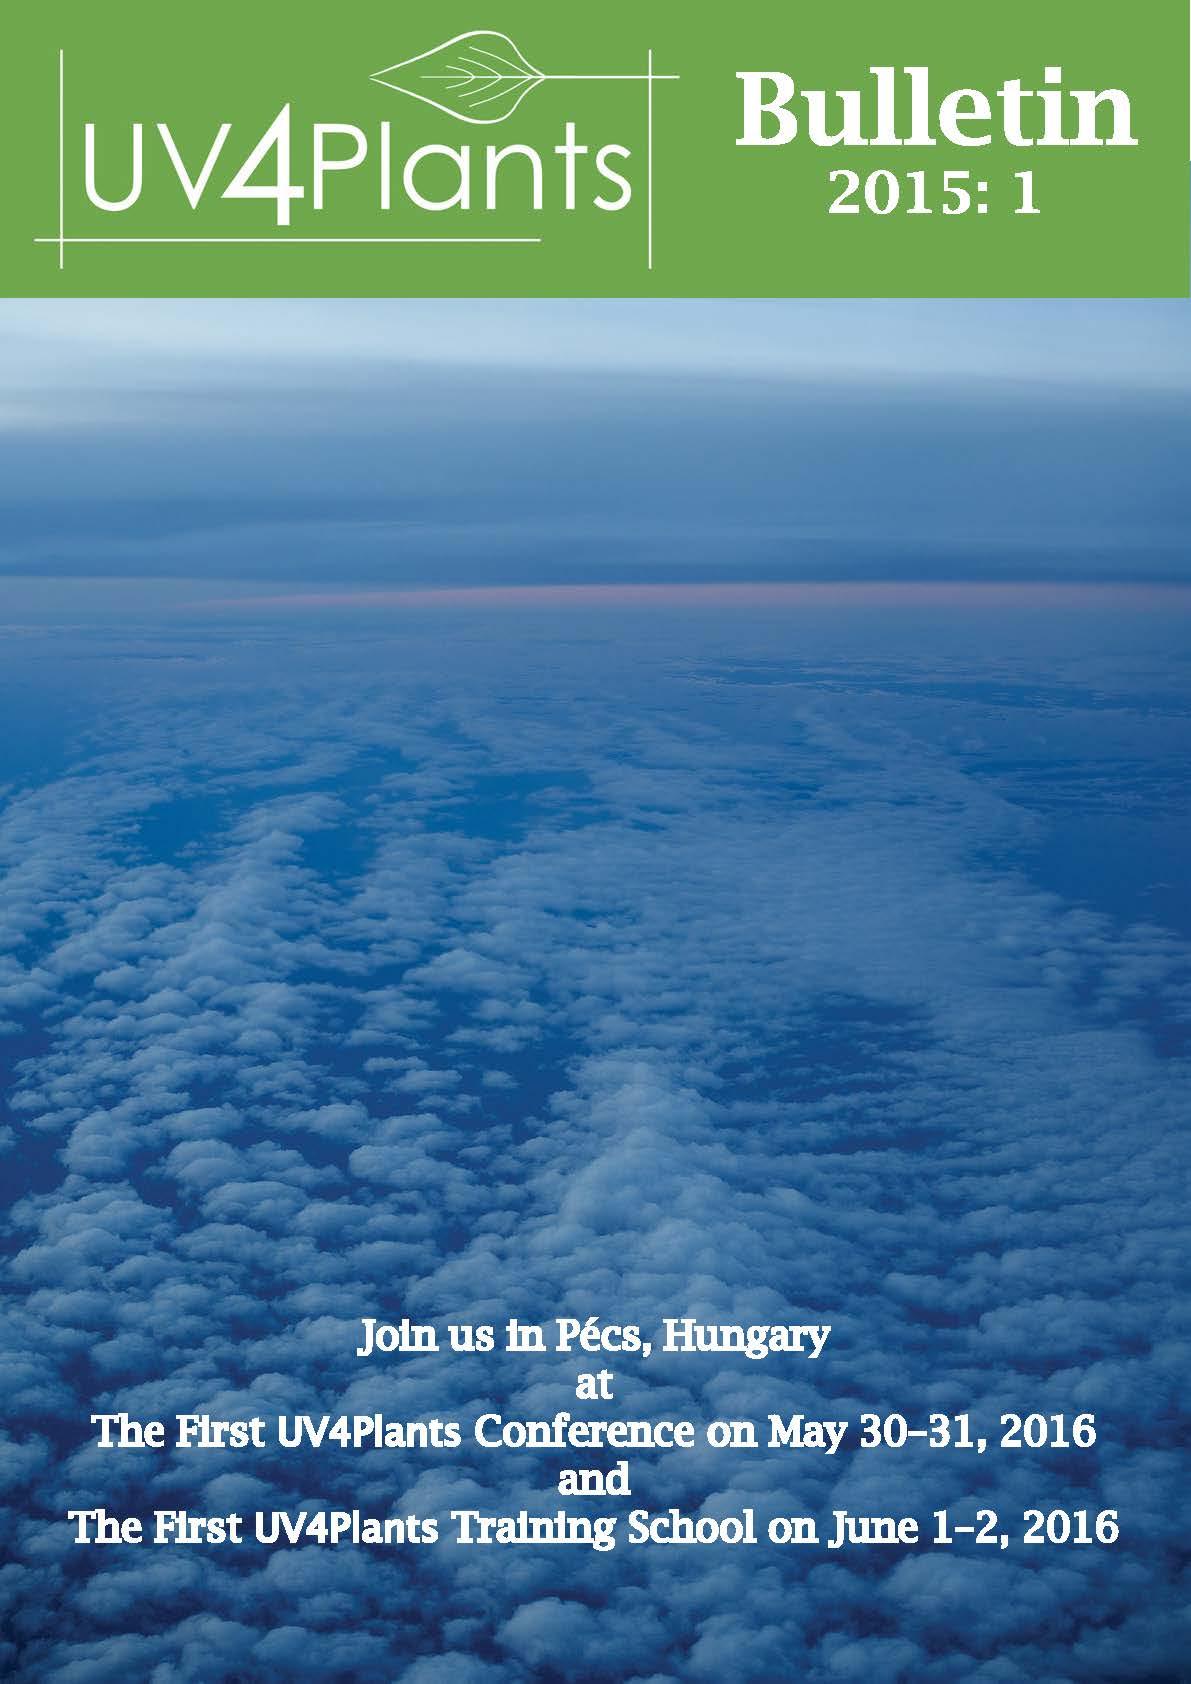 Cover of the UV4Plants Bulletin 2015:1